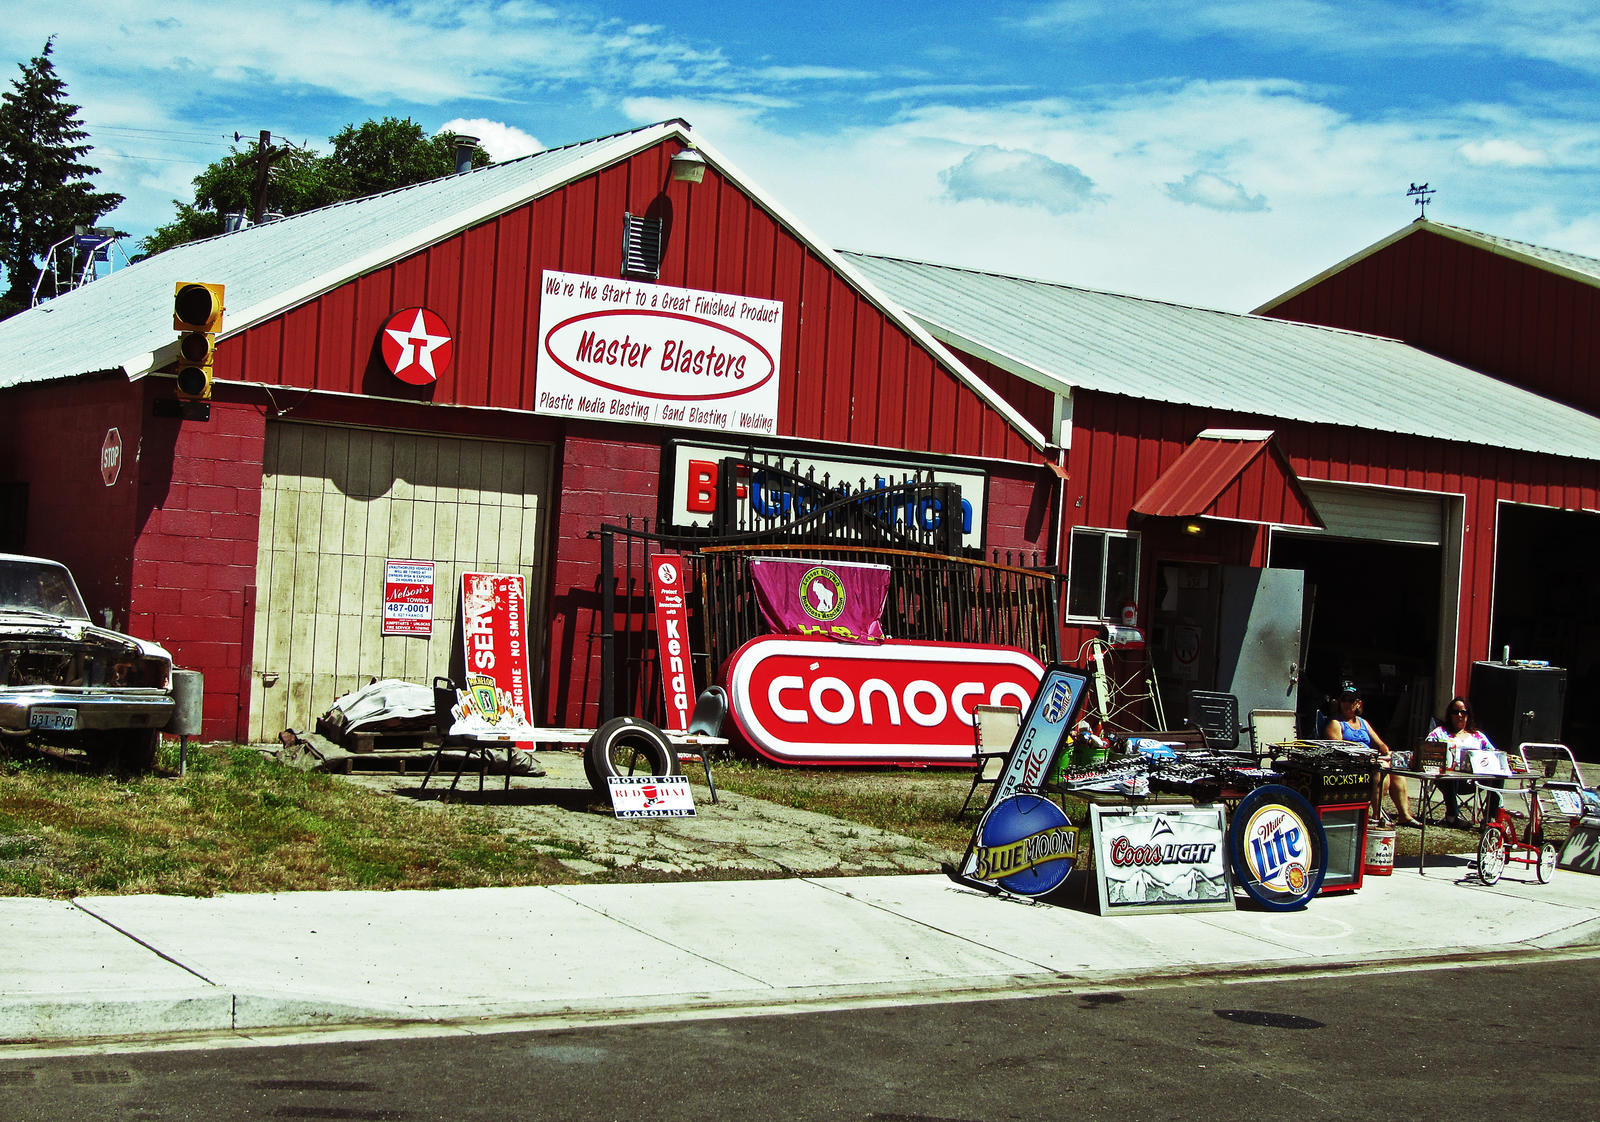 Man Cave Store Spokane : Man cave decorator store by tundra timmy on deviantart